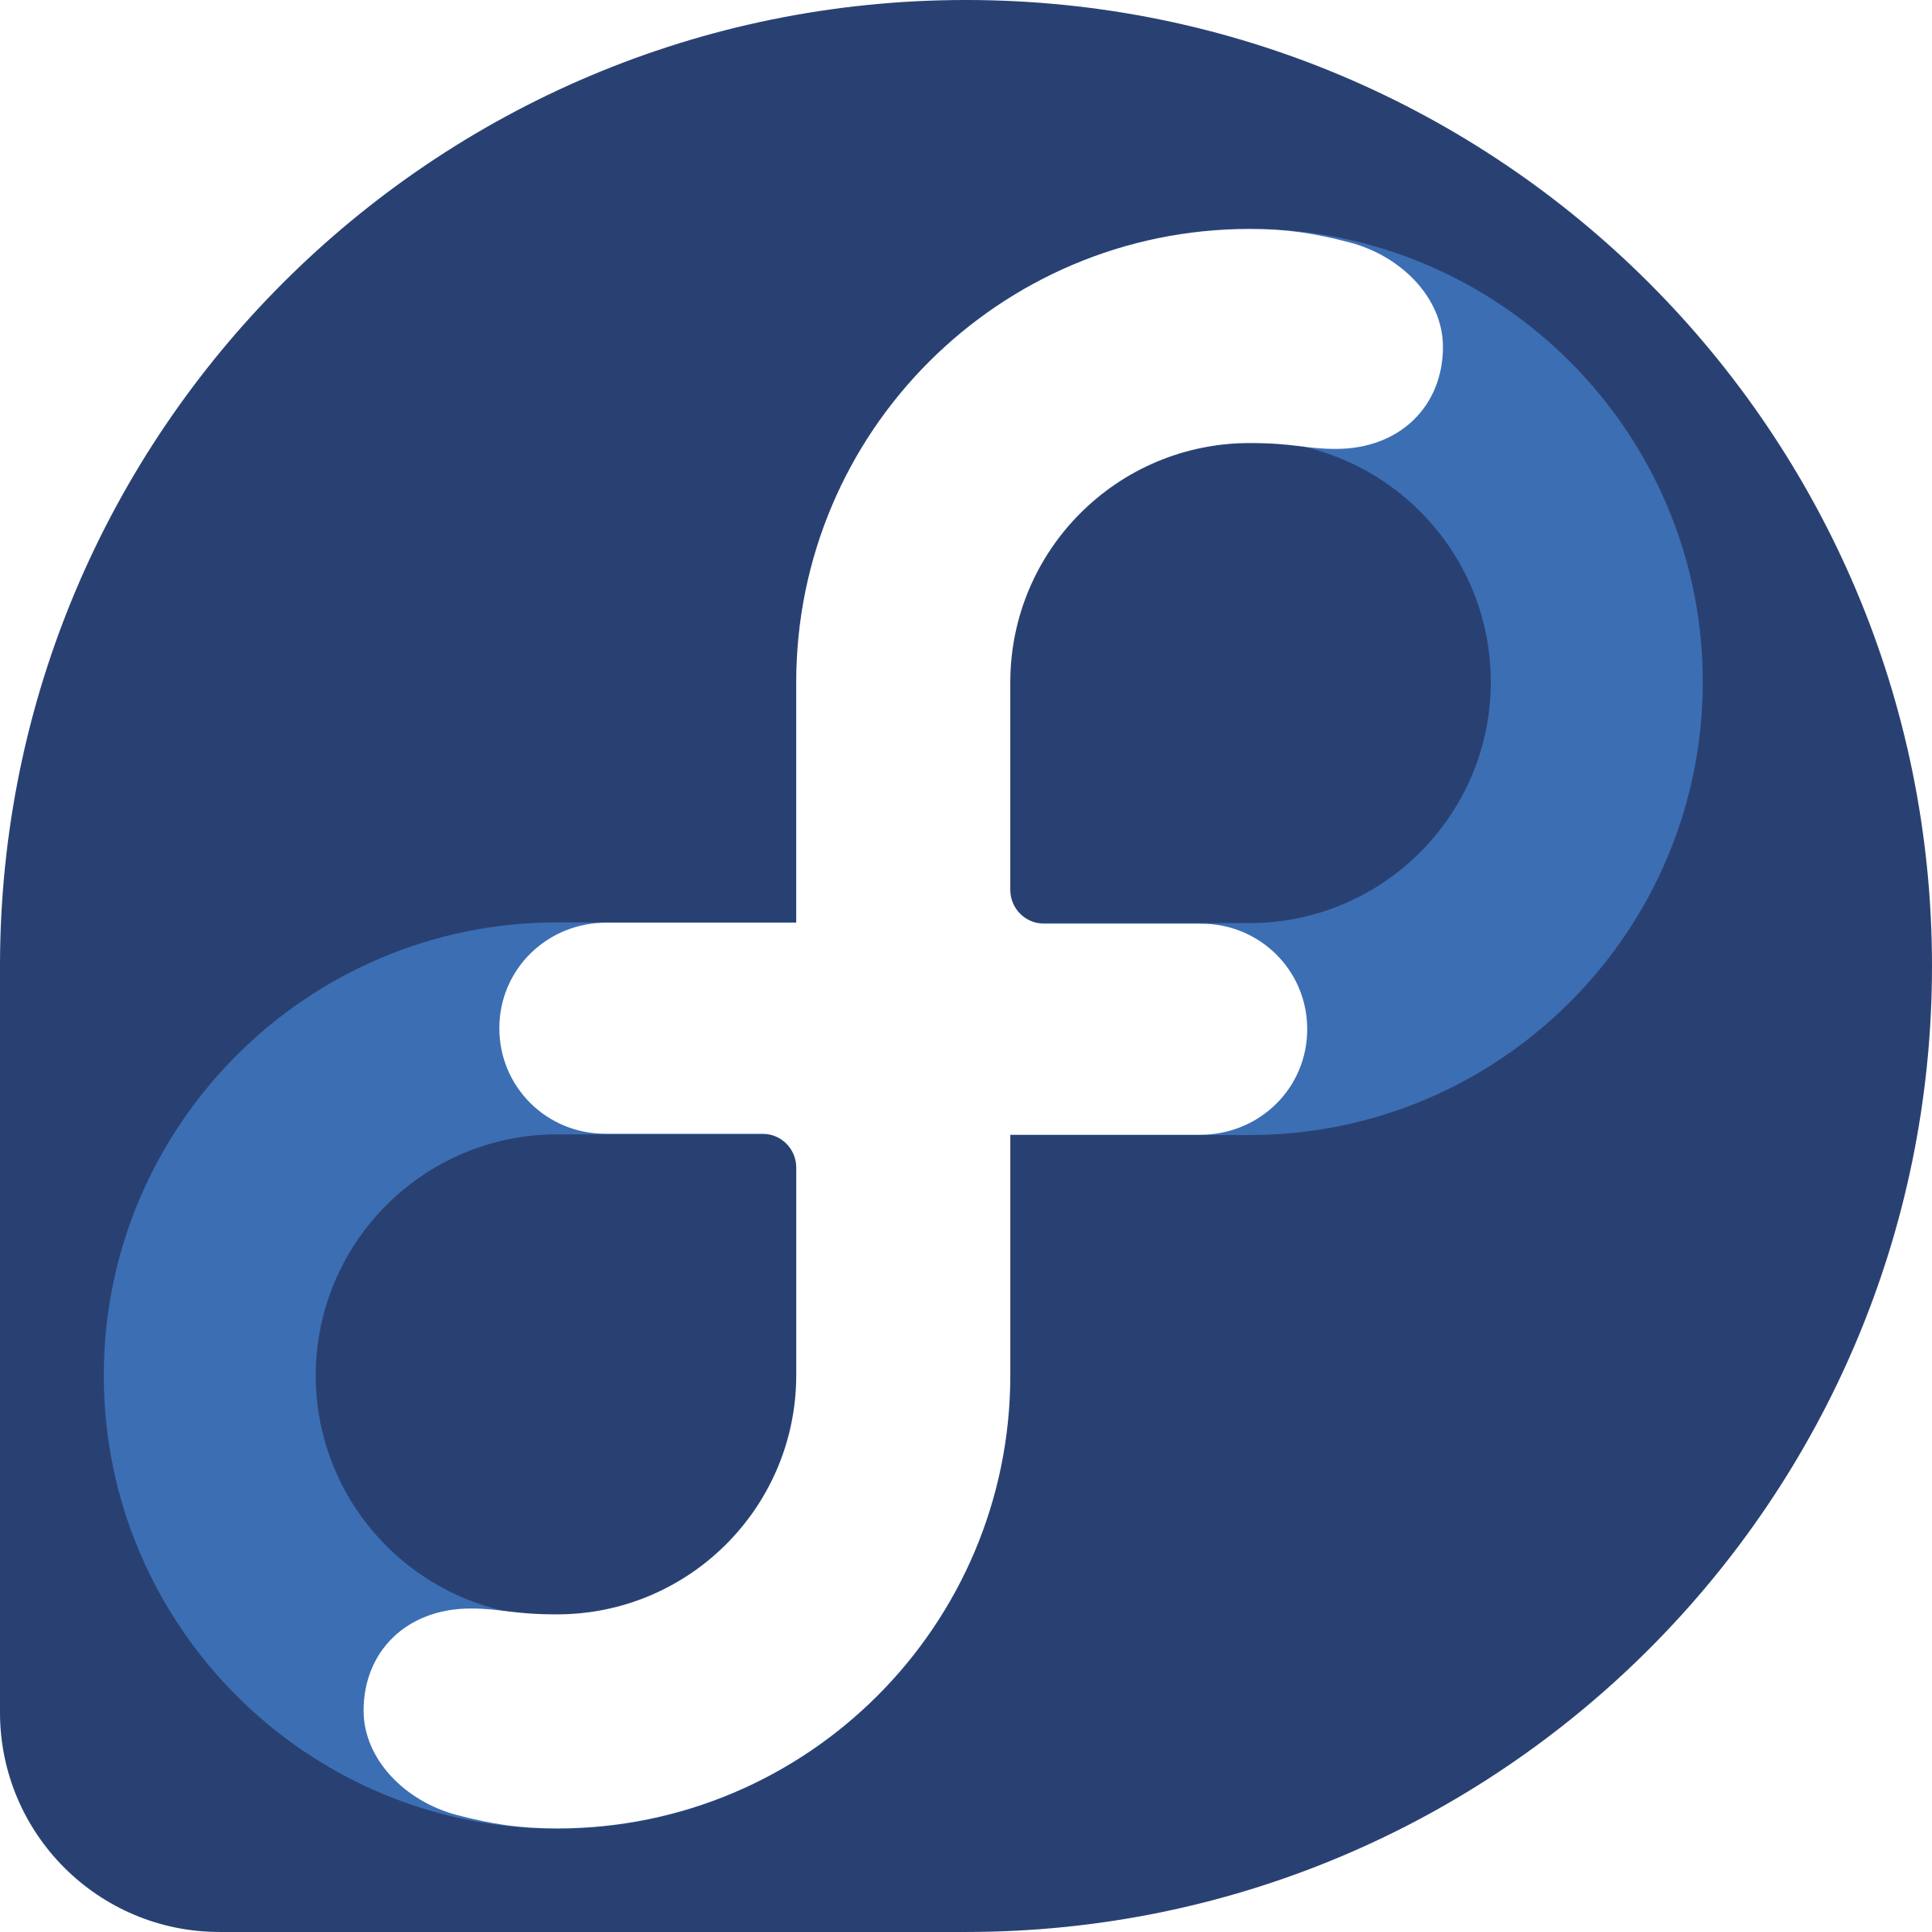 Logo png transparent svg. Fedora clipart vector